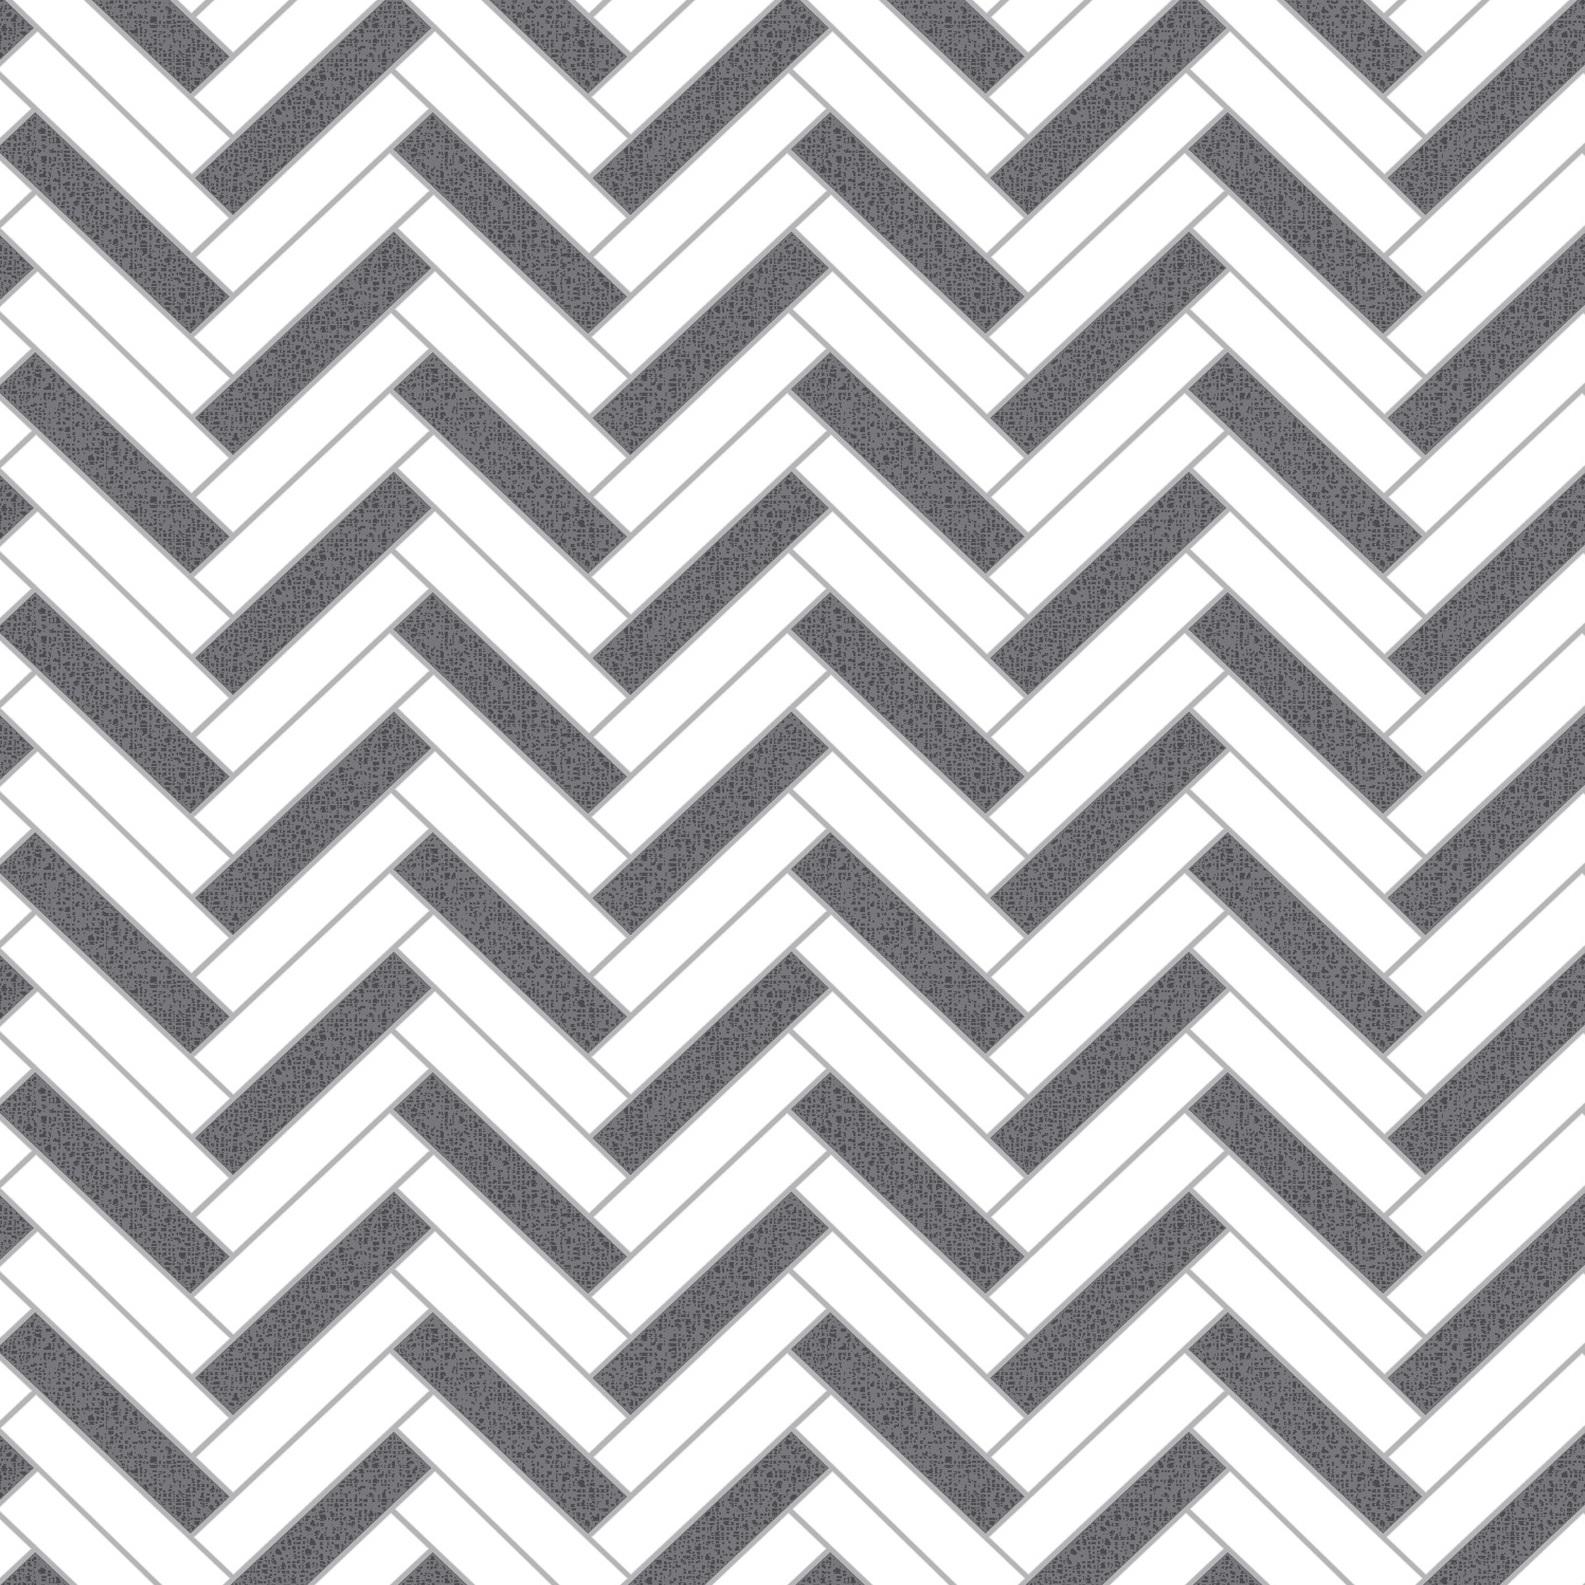 Rasch Chevron Wallpaper 888225 Wallpaper Allen Braithwaite 1585x1585